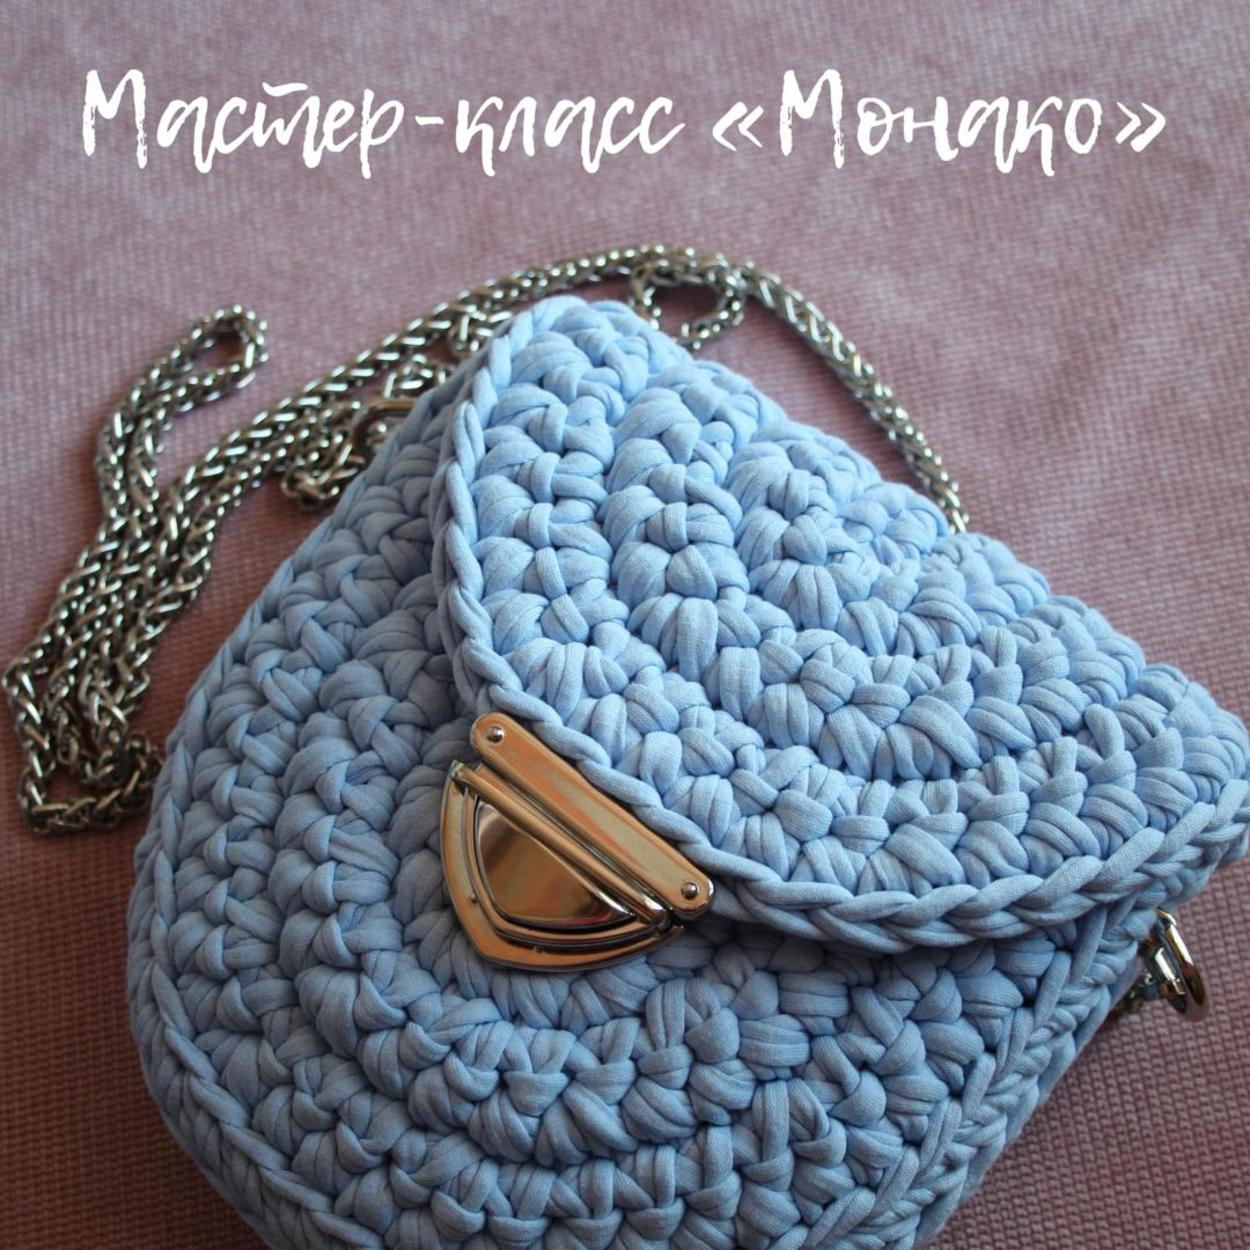 Мастер-класс сумка Монако